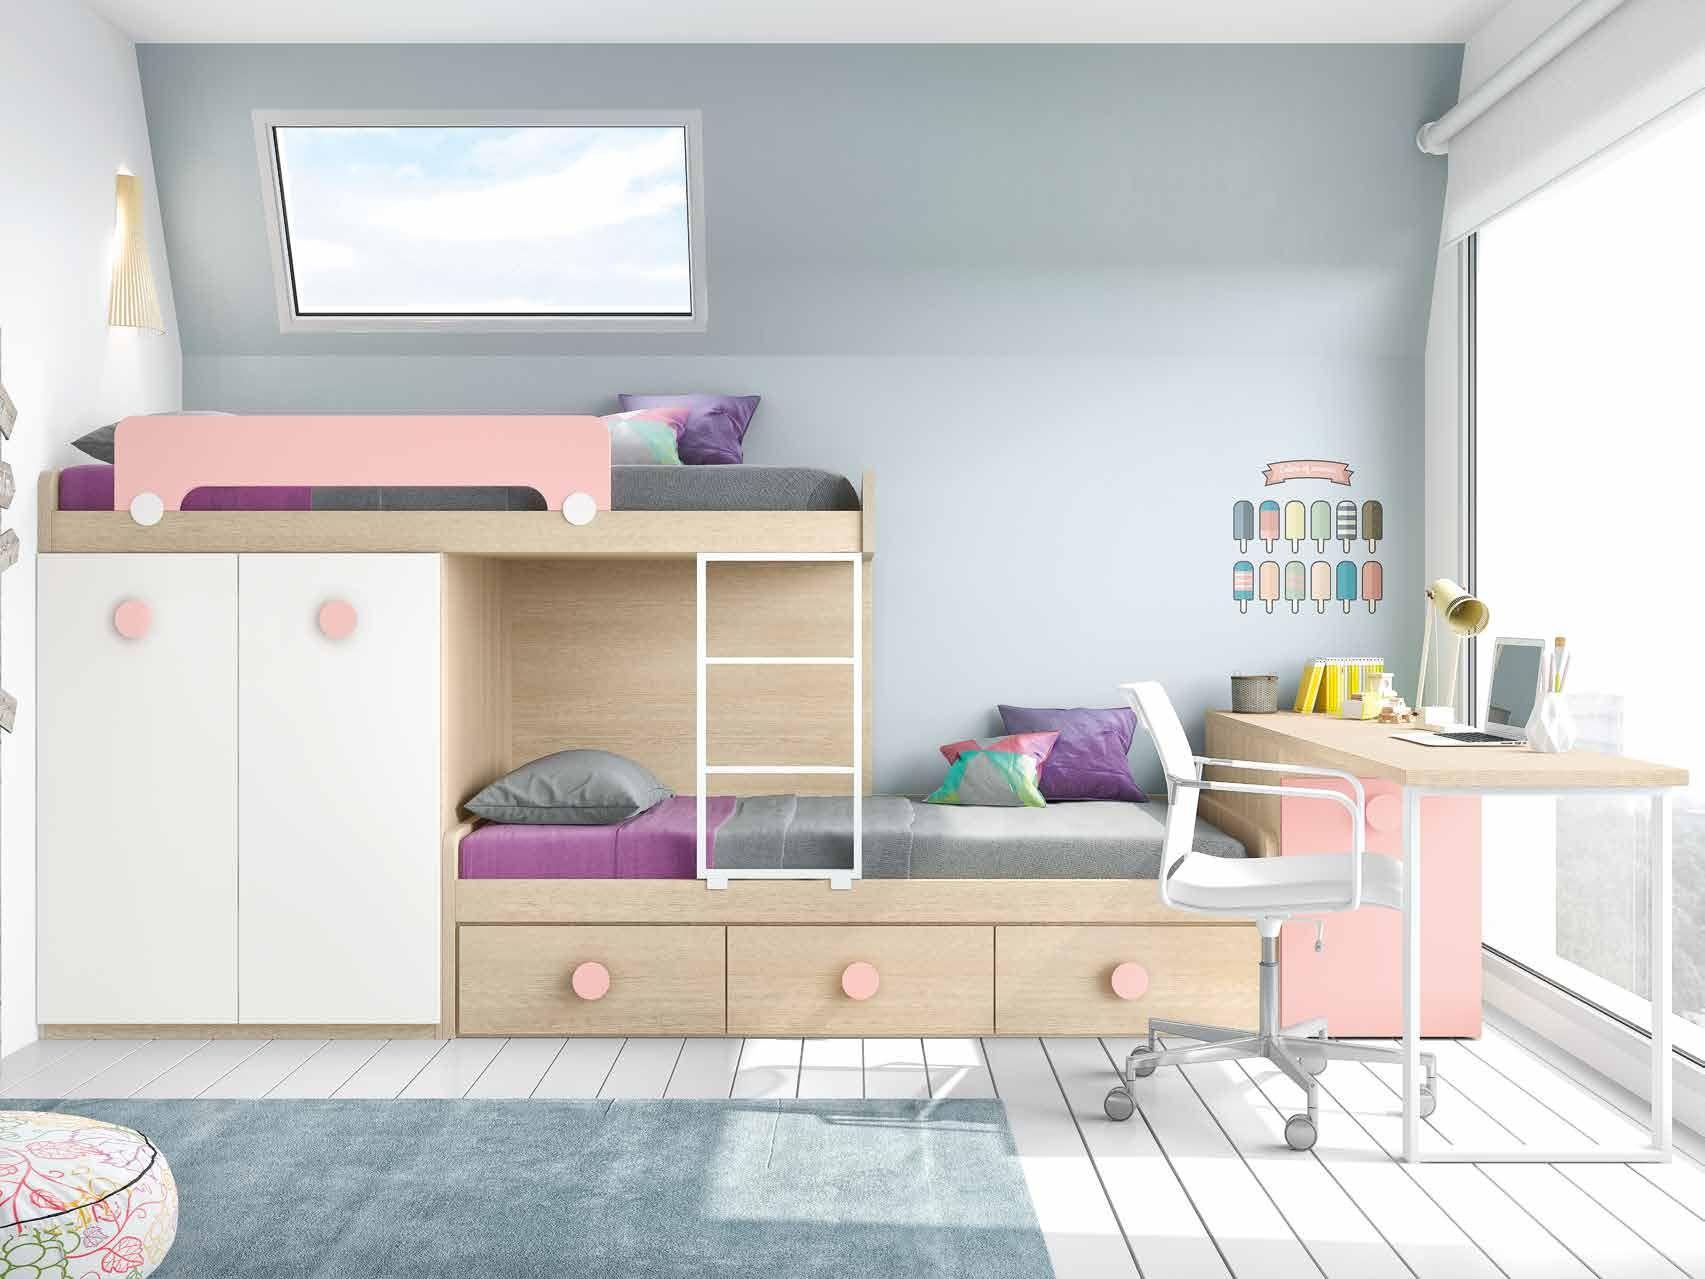 Cama tren combinada #cama #infantil #muebles #juvenil #espaijuvenil ...